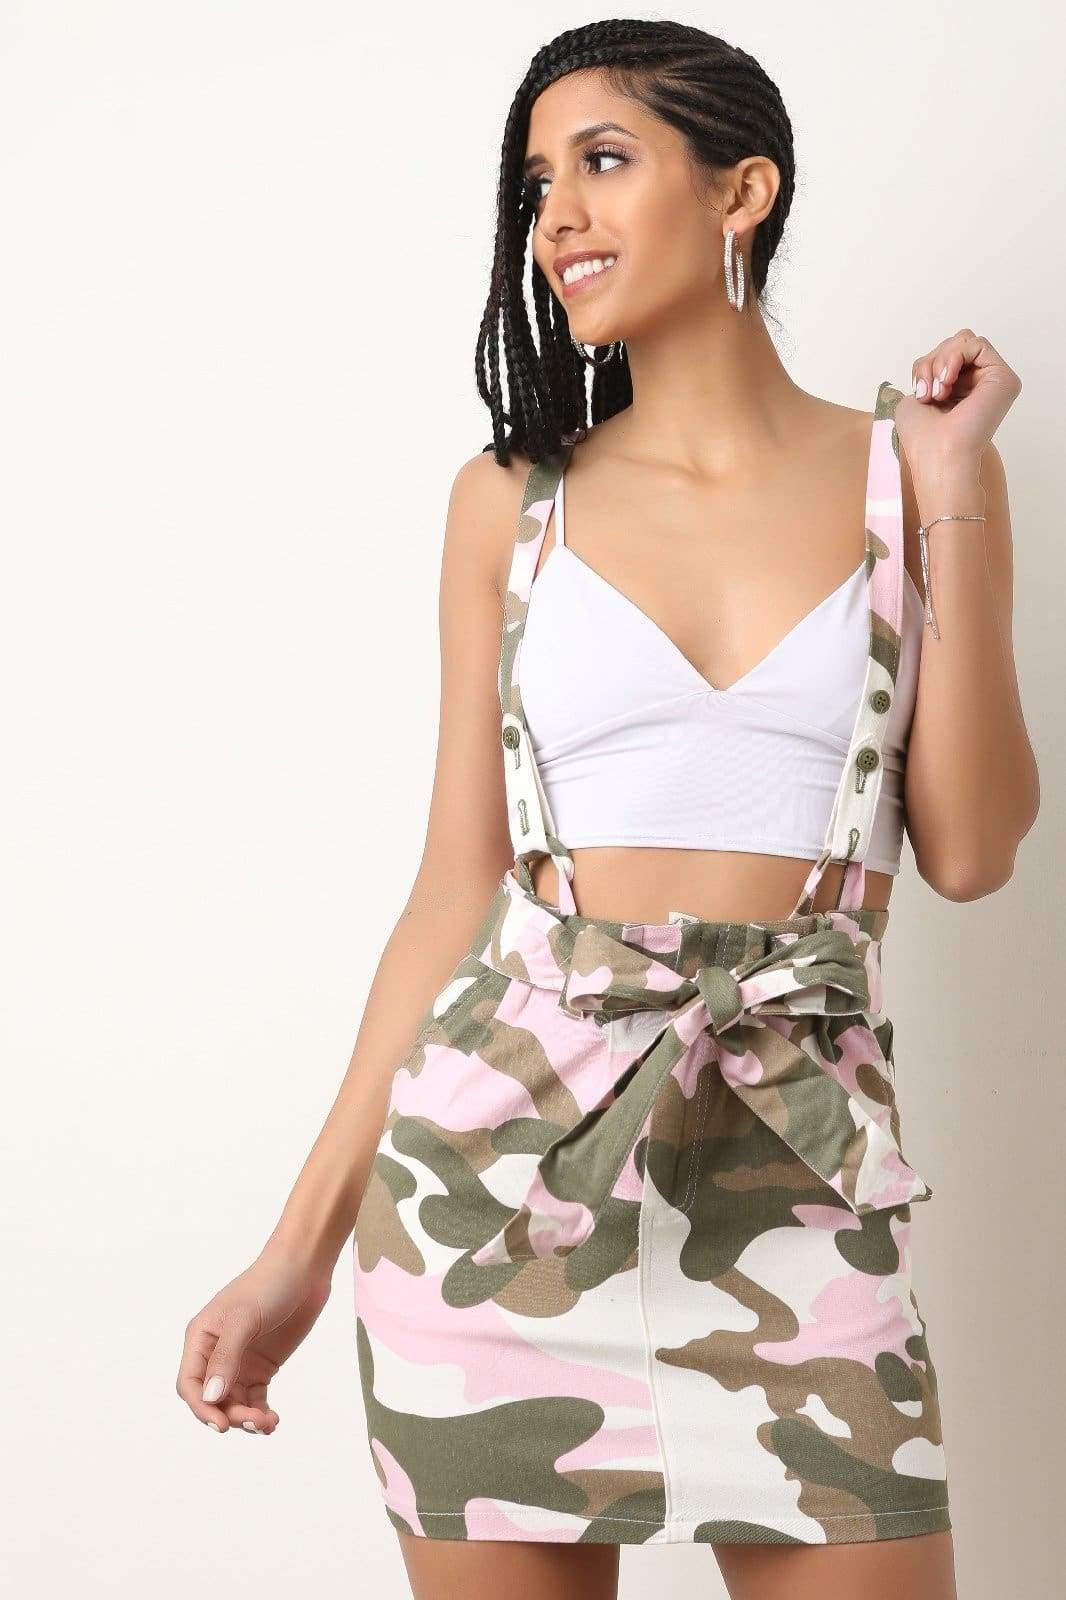 086a714ed25c Pink Camo Suspender Mini Skirt in 2019 | Heels | Fashion, Skirts, Mini  skirts